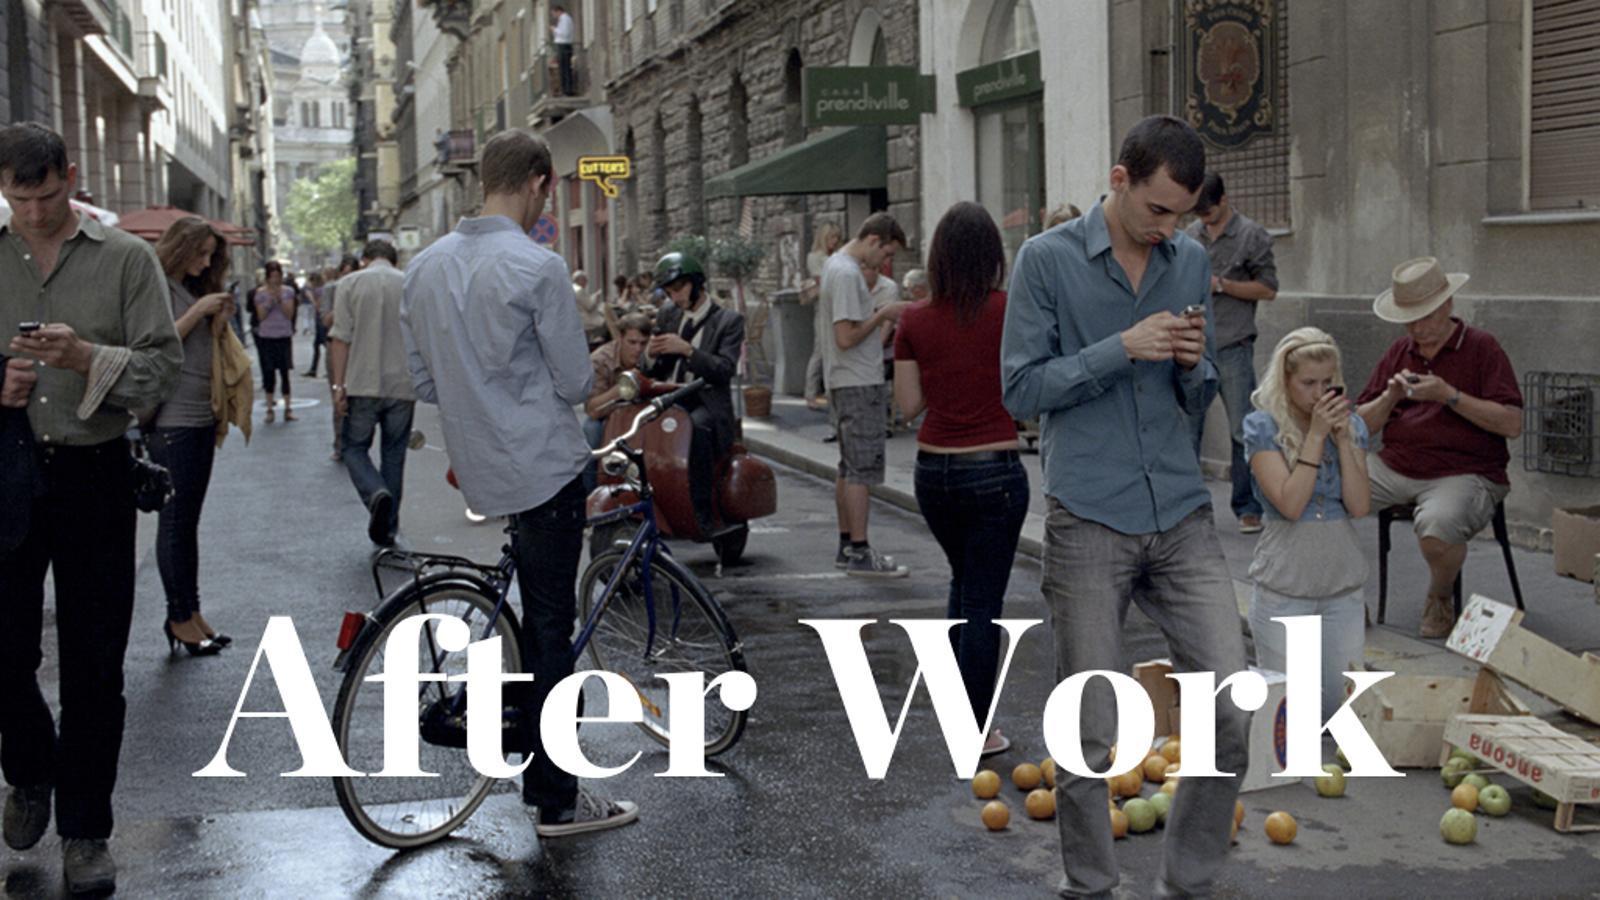 L'After Work: Ets un 'hipster' o un 'muppie'?